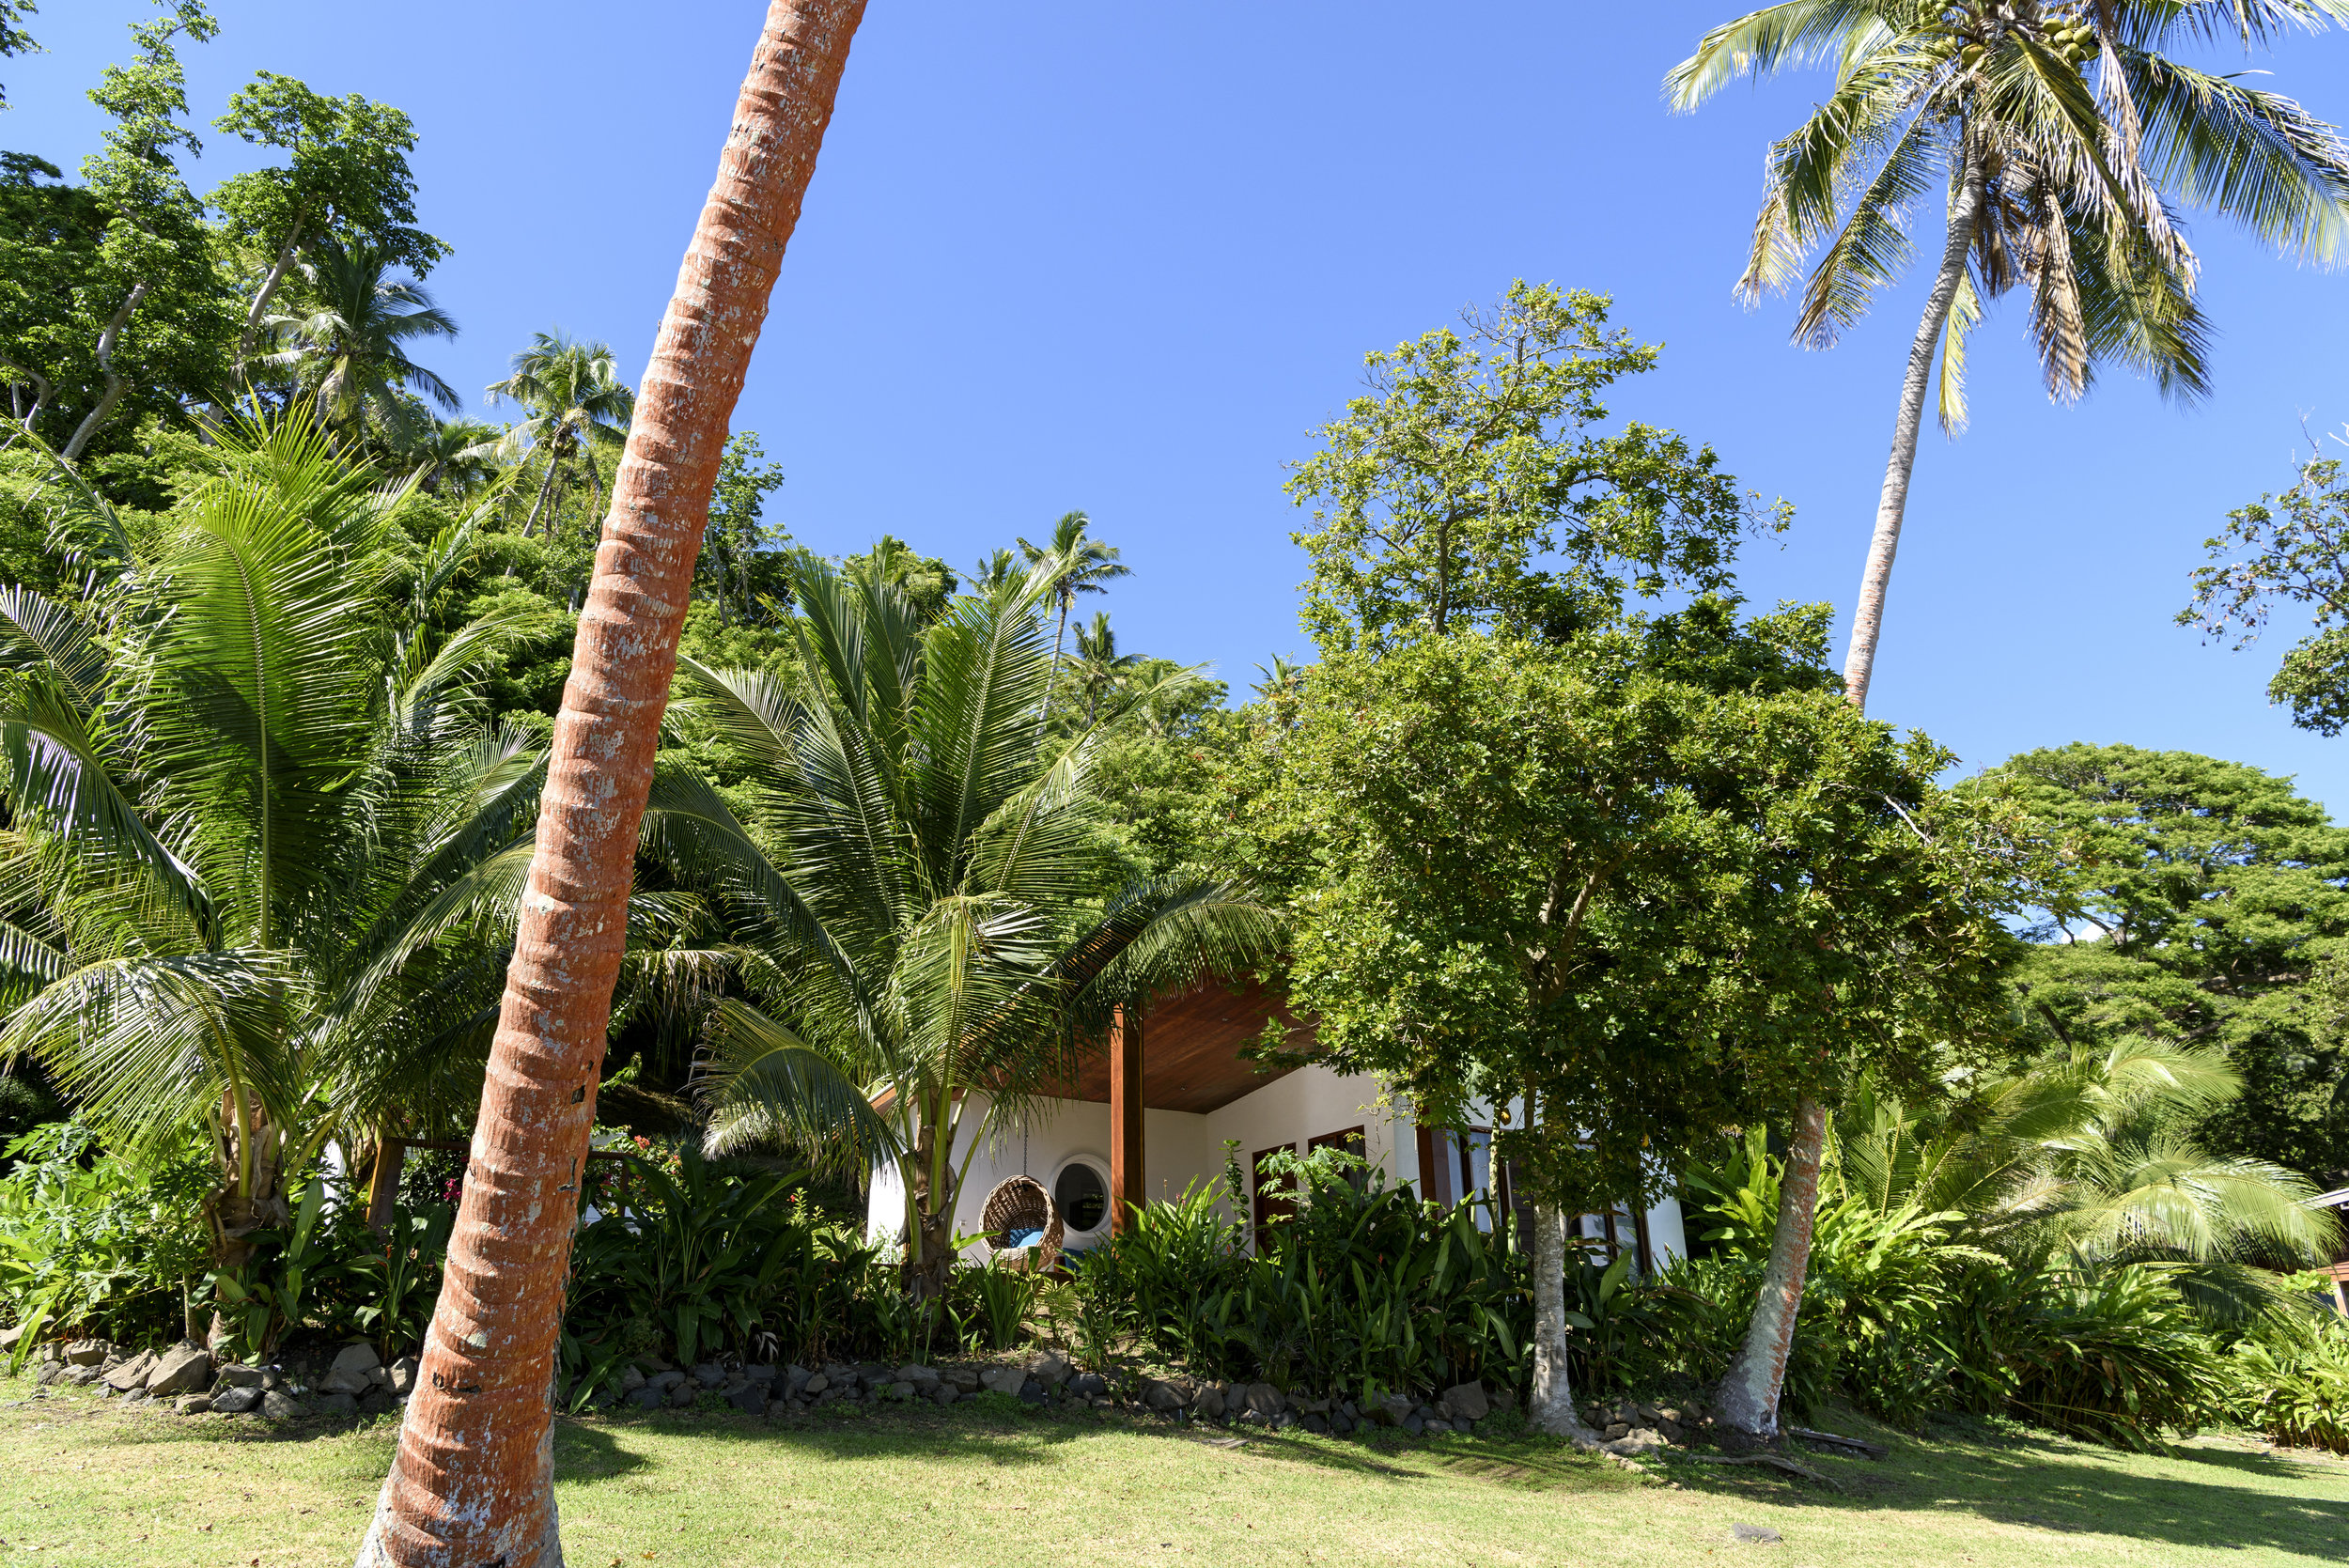 Fiji Resort - Couples Accommodation - Royal Retreat - Honeymoon - The Remote Resort9.jpg